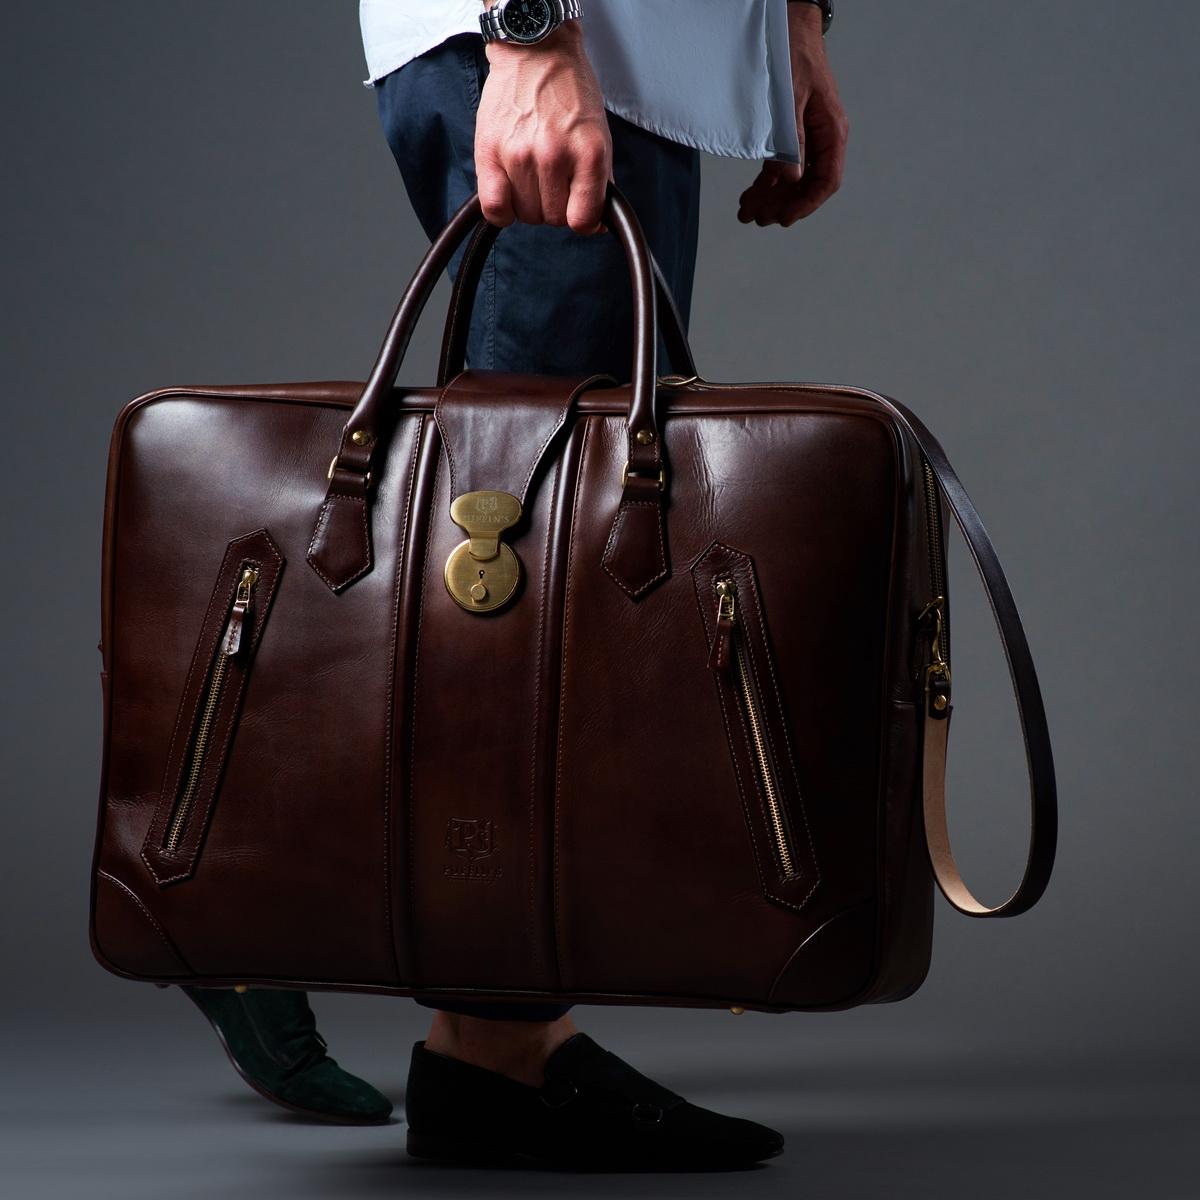 чемодан для путешествий holiday каштановый